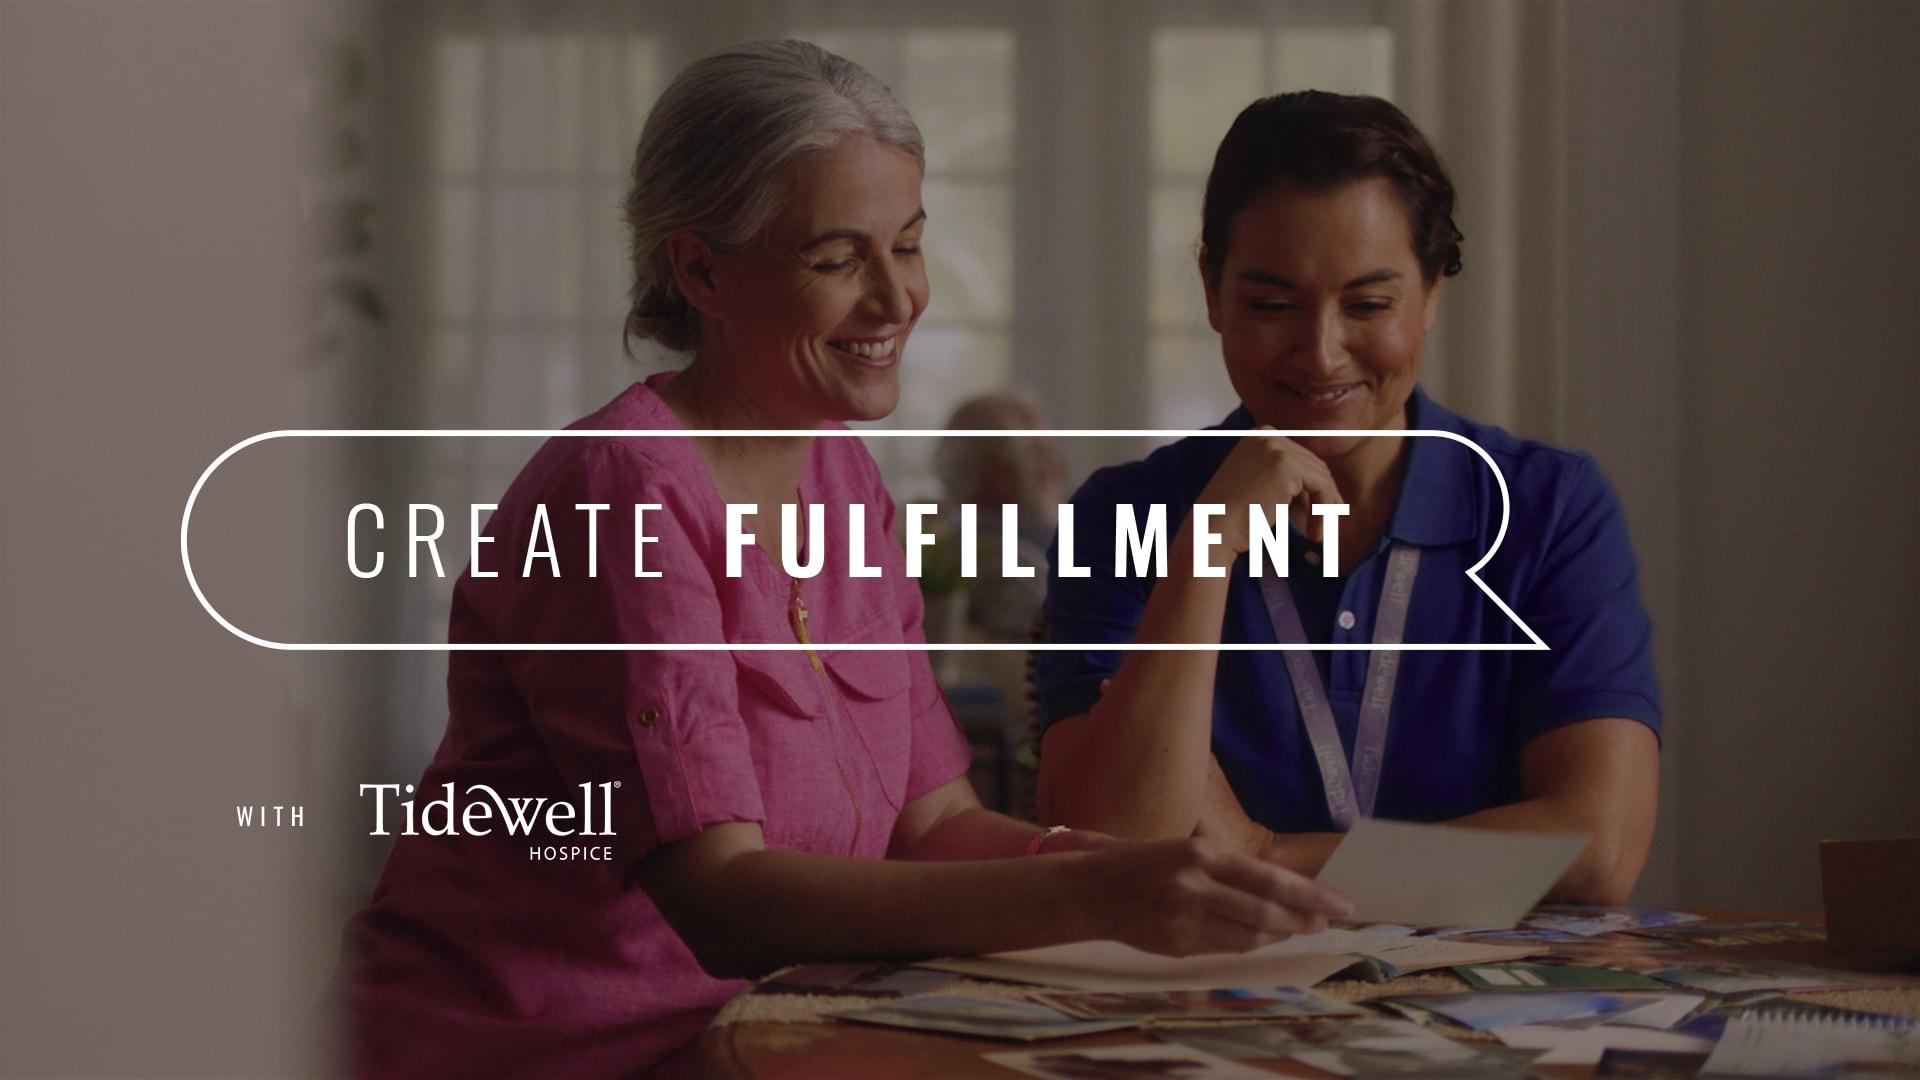 Create Fulfillment